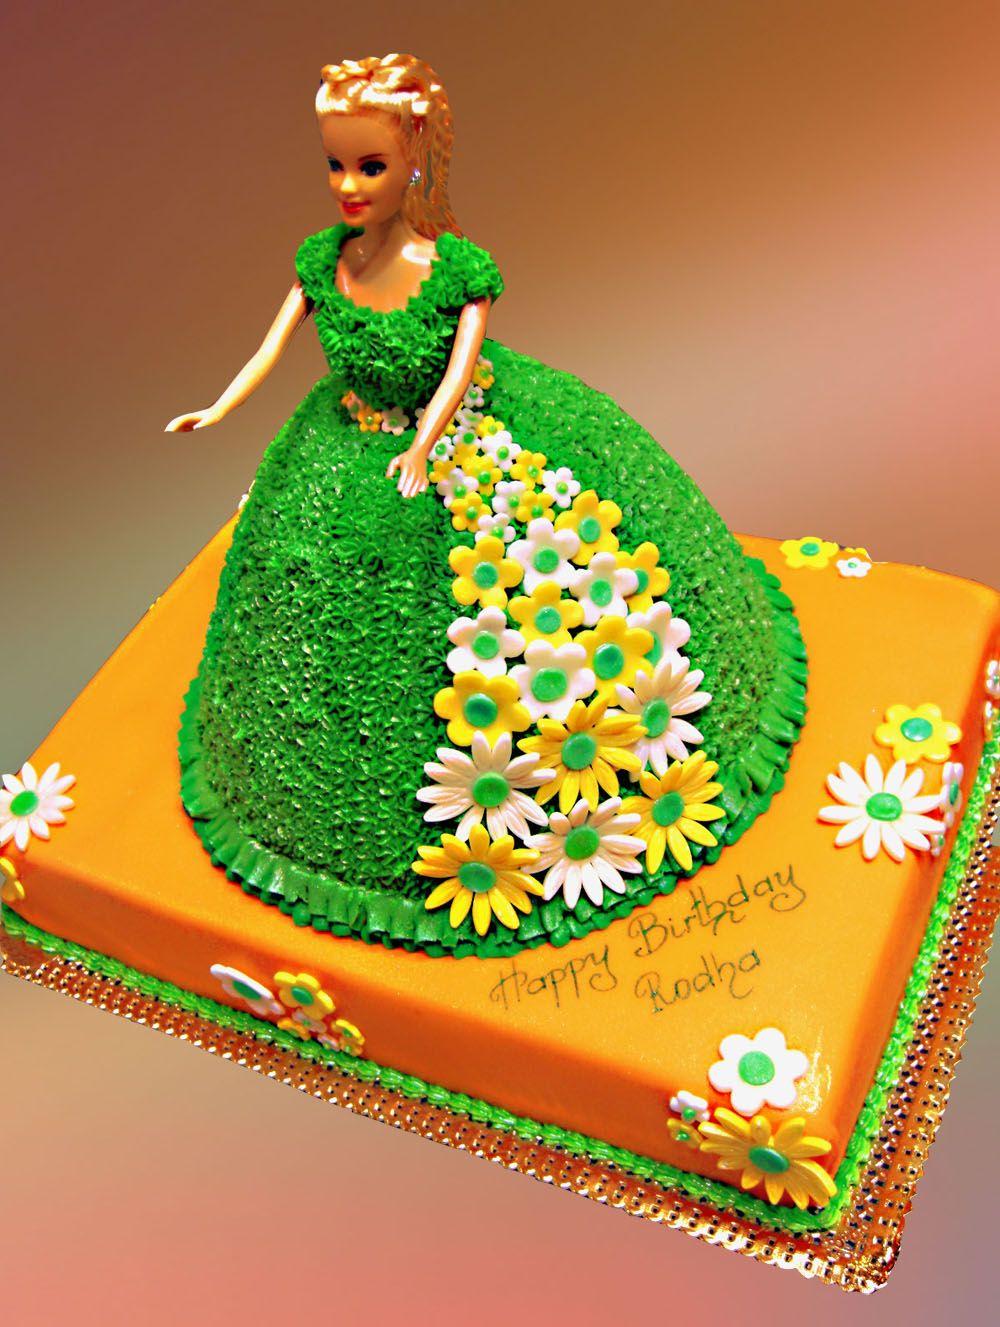 Barbie Princess Cake Barbi Pinterest Birthday Cakes And Cake - Birthday cake doll princess